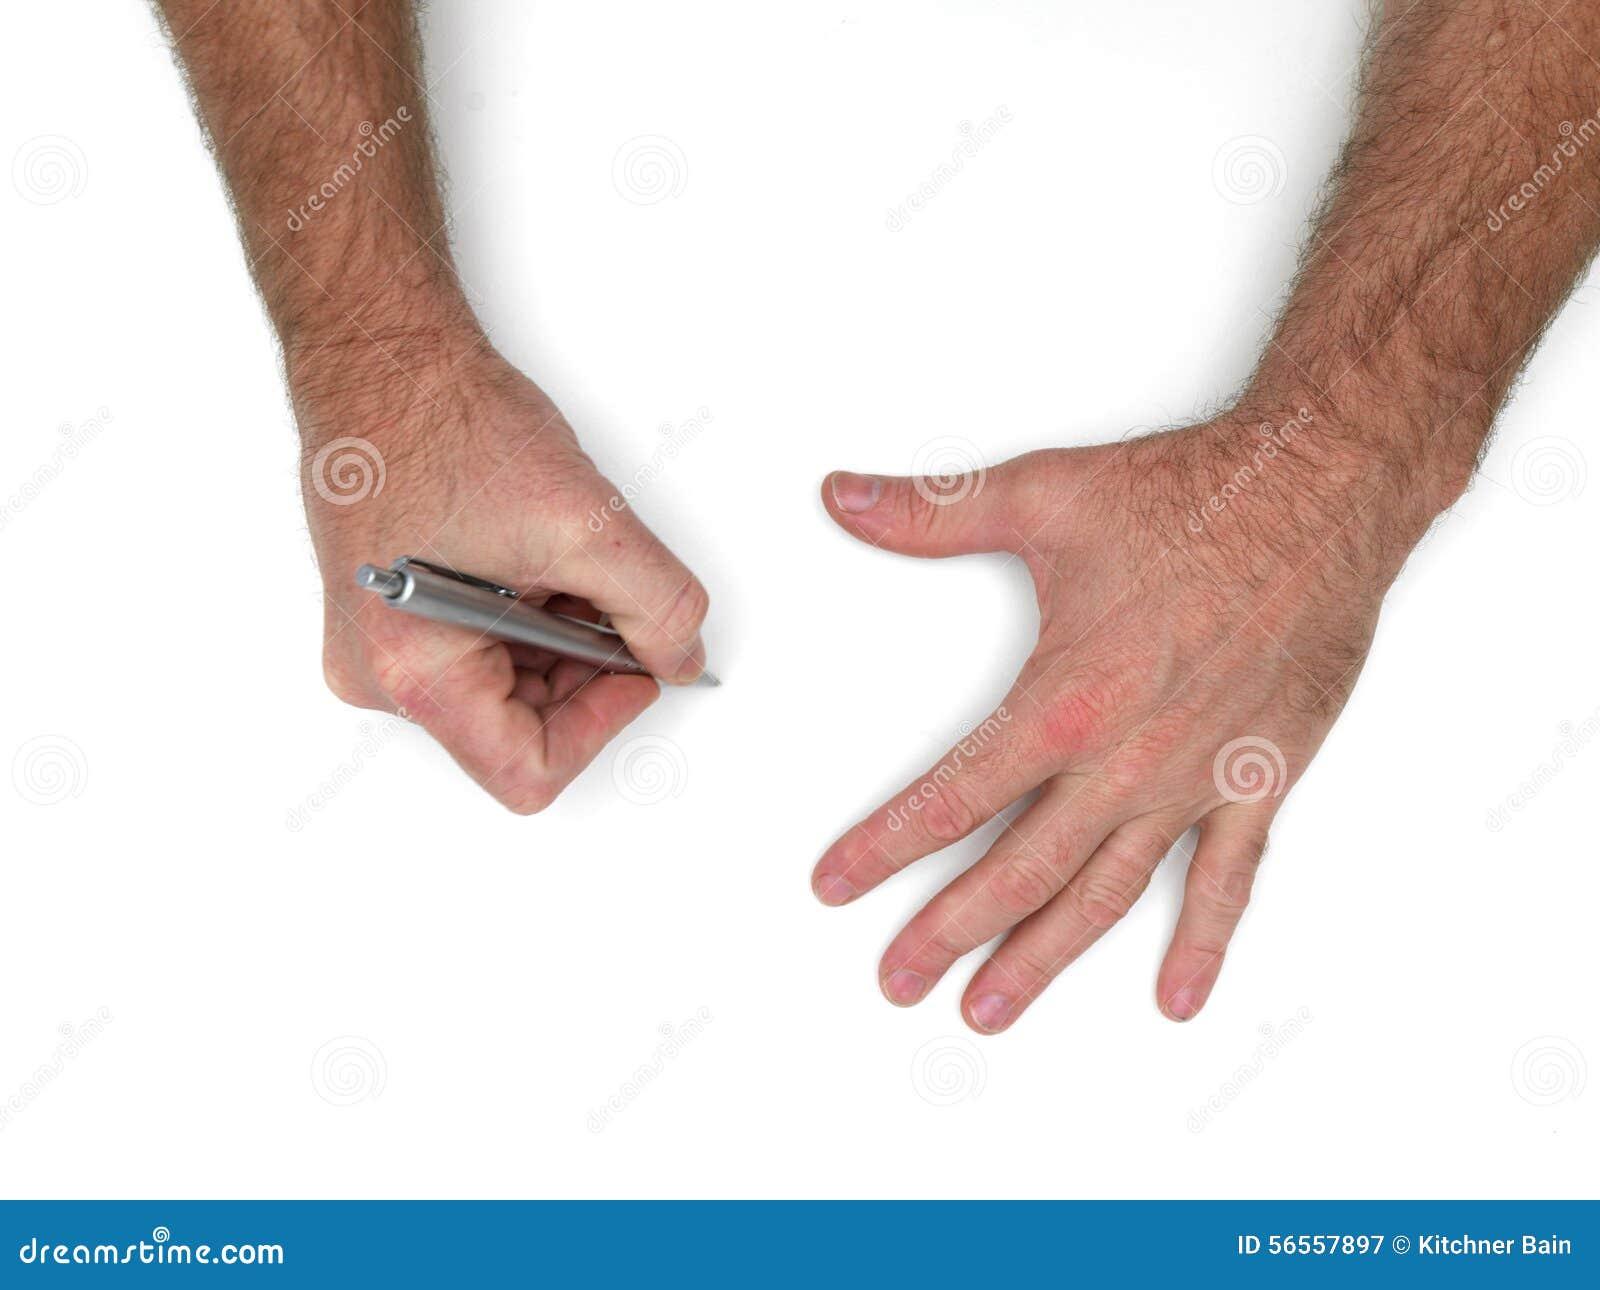 Download χειρονομίες στοκ εικόνα. εικόνα από χέρι, ασφάλεια, ανθρώπινος - 56557897